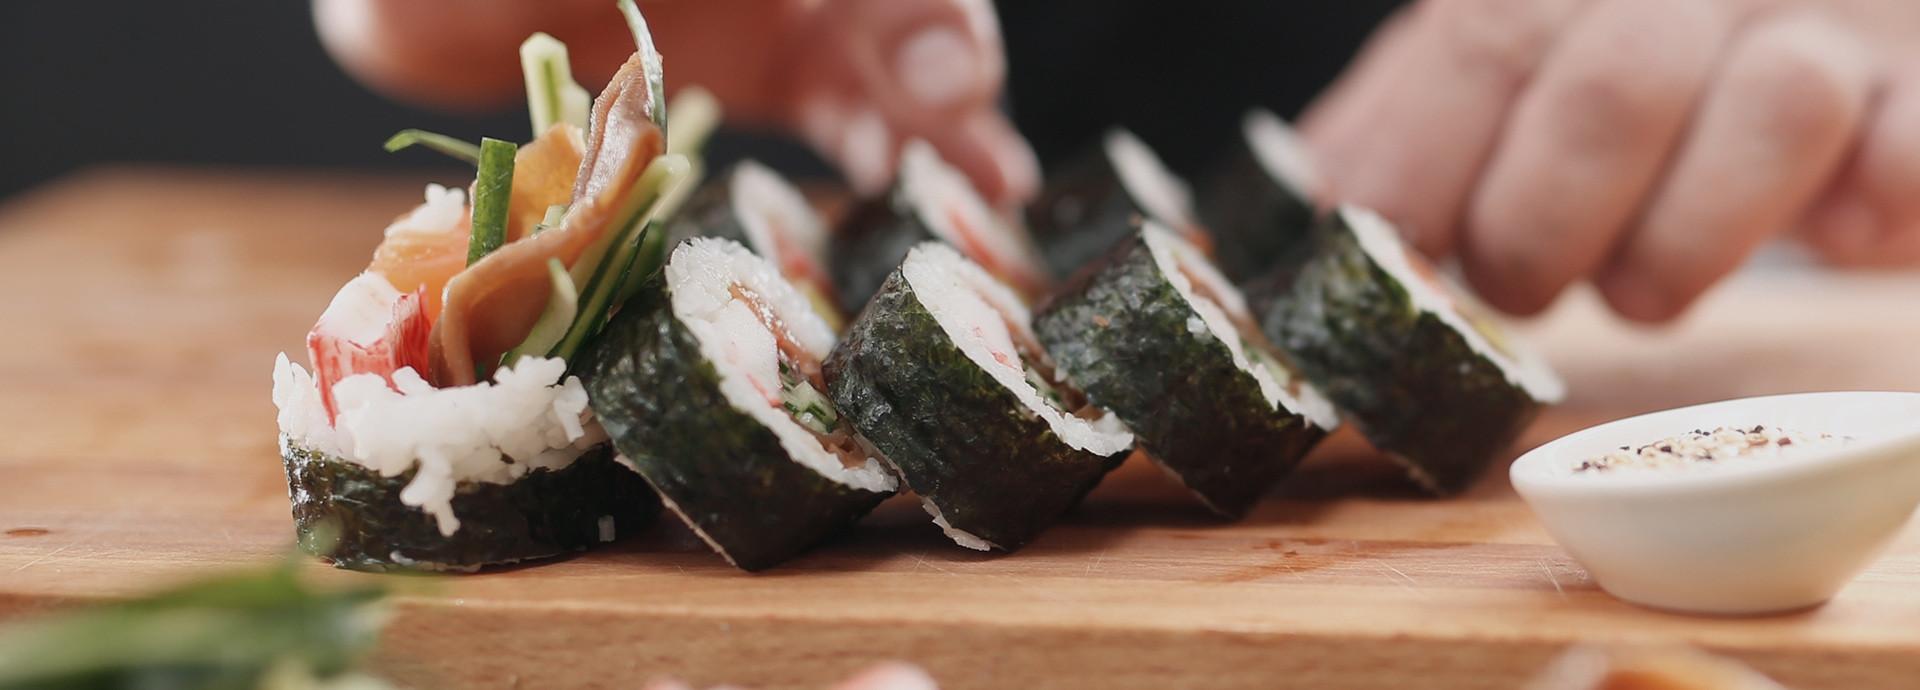 Maki Sushi Express - Mail Montenach